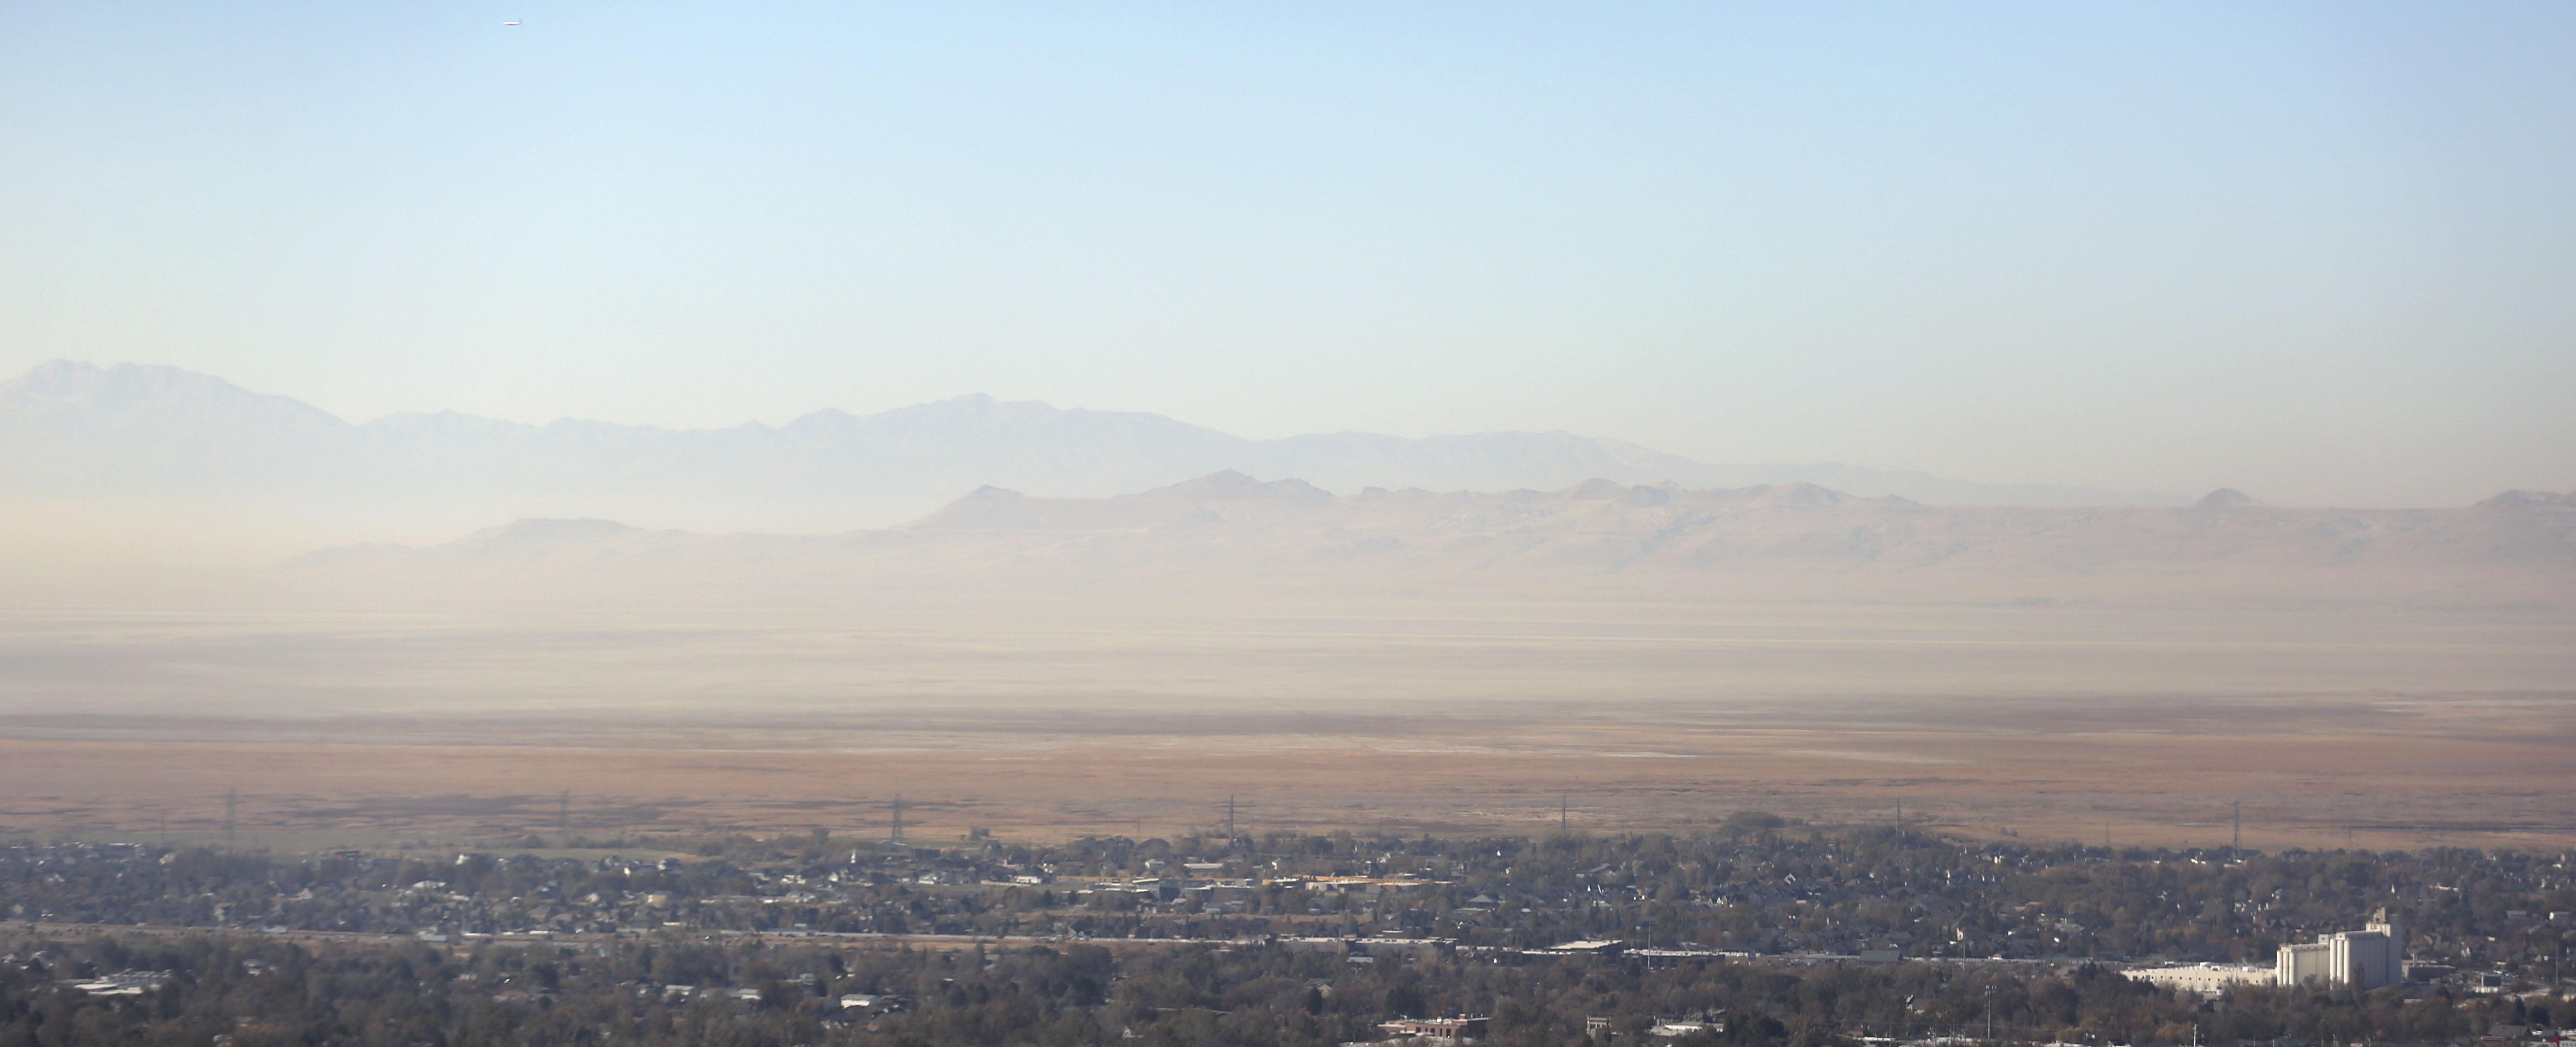 Smog settles over Davis County on Wednesday, Oct. 28, 2020.